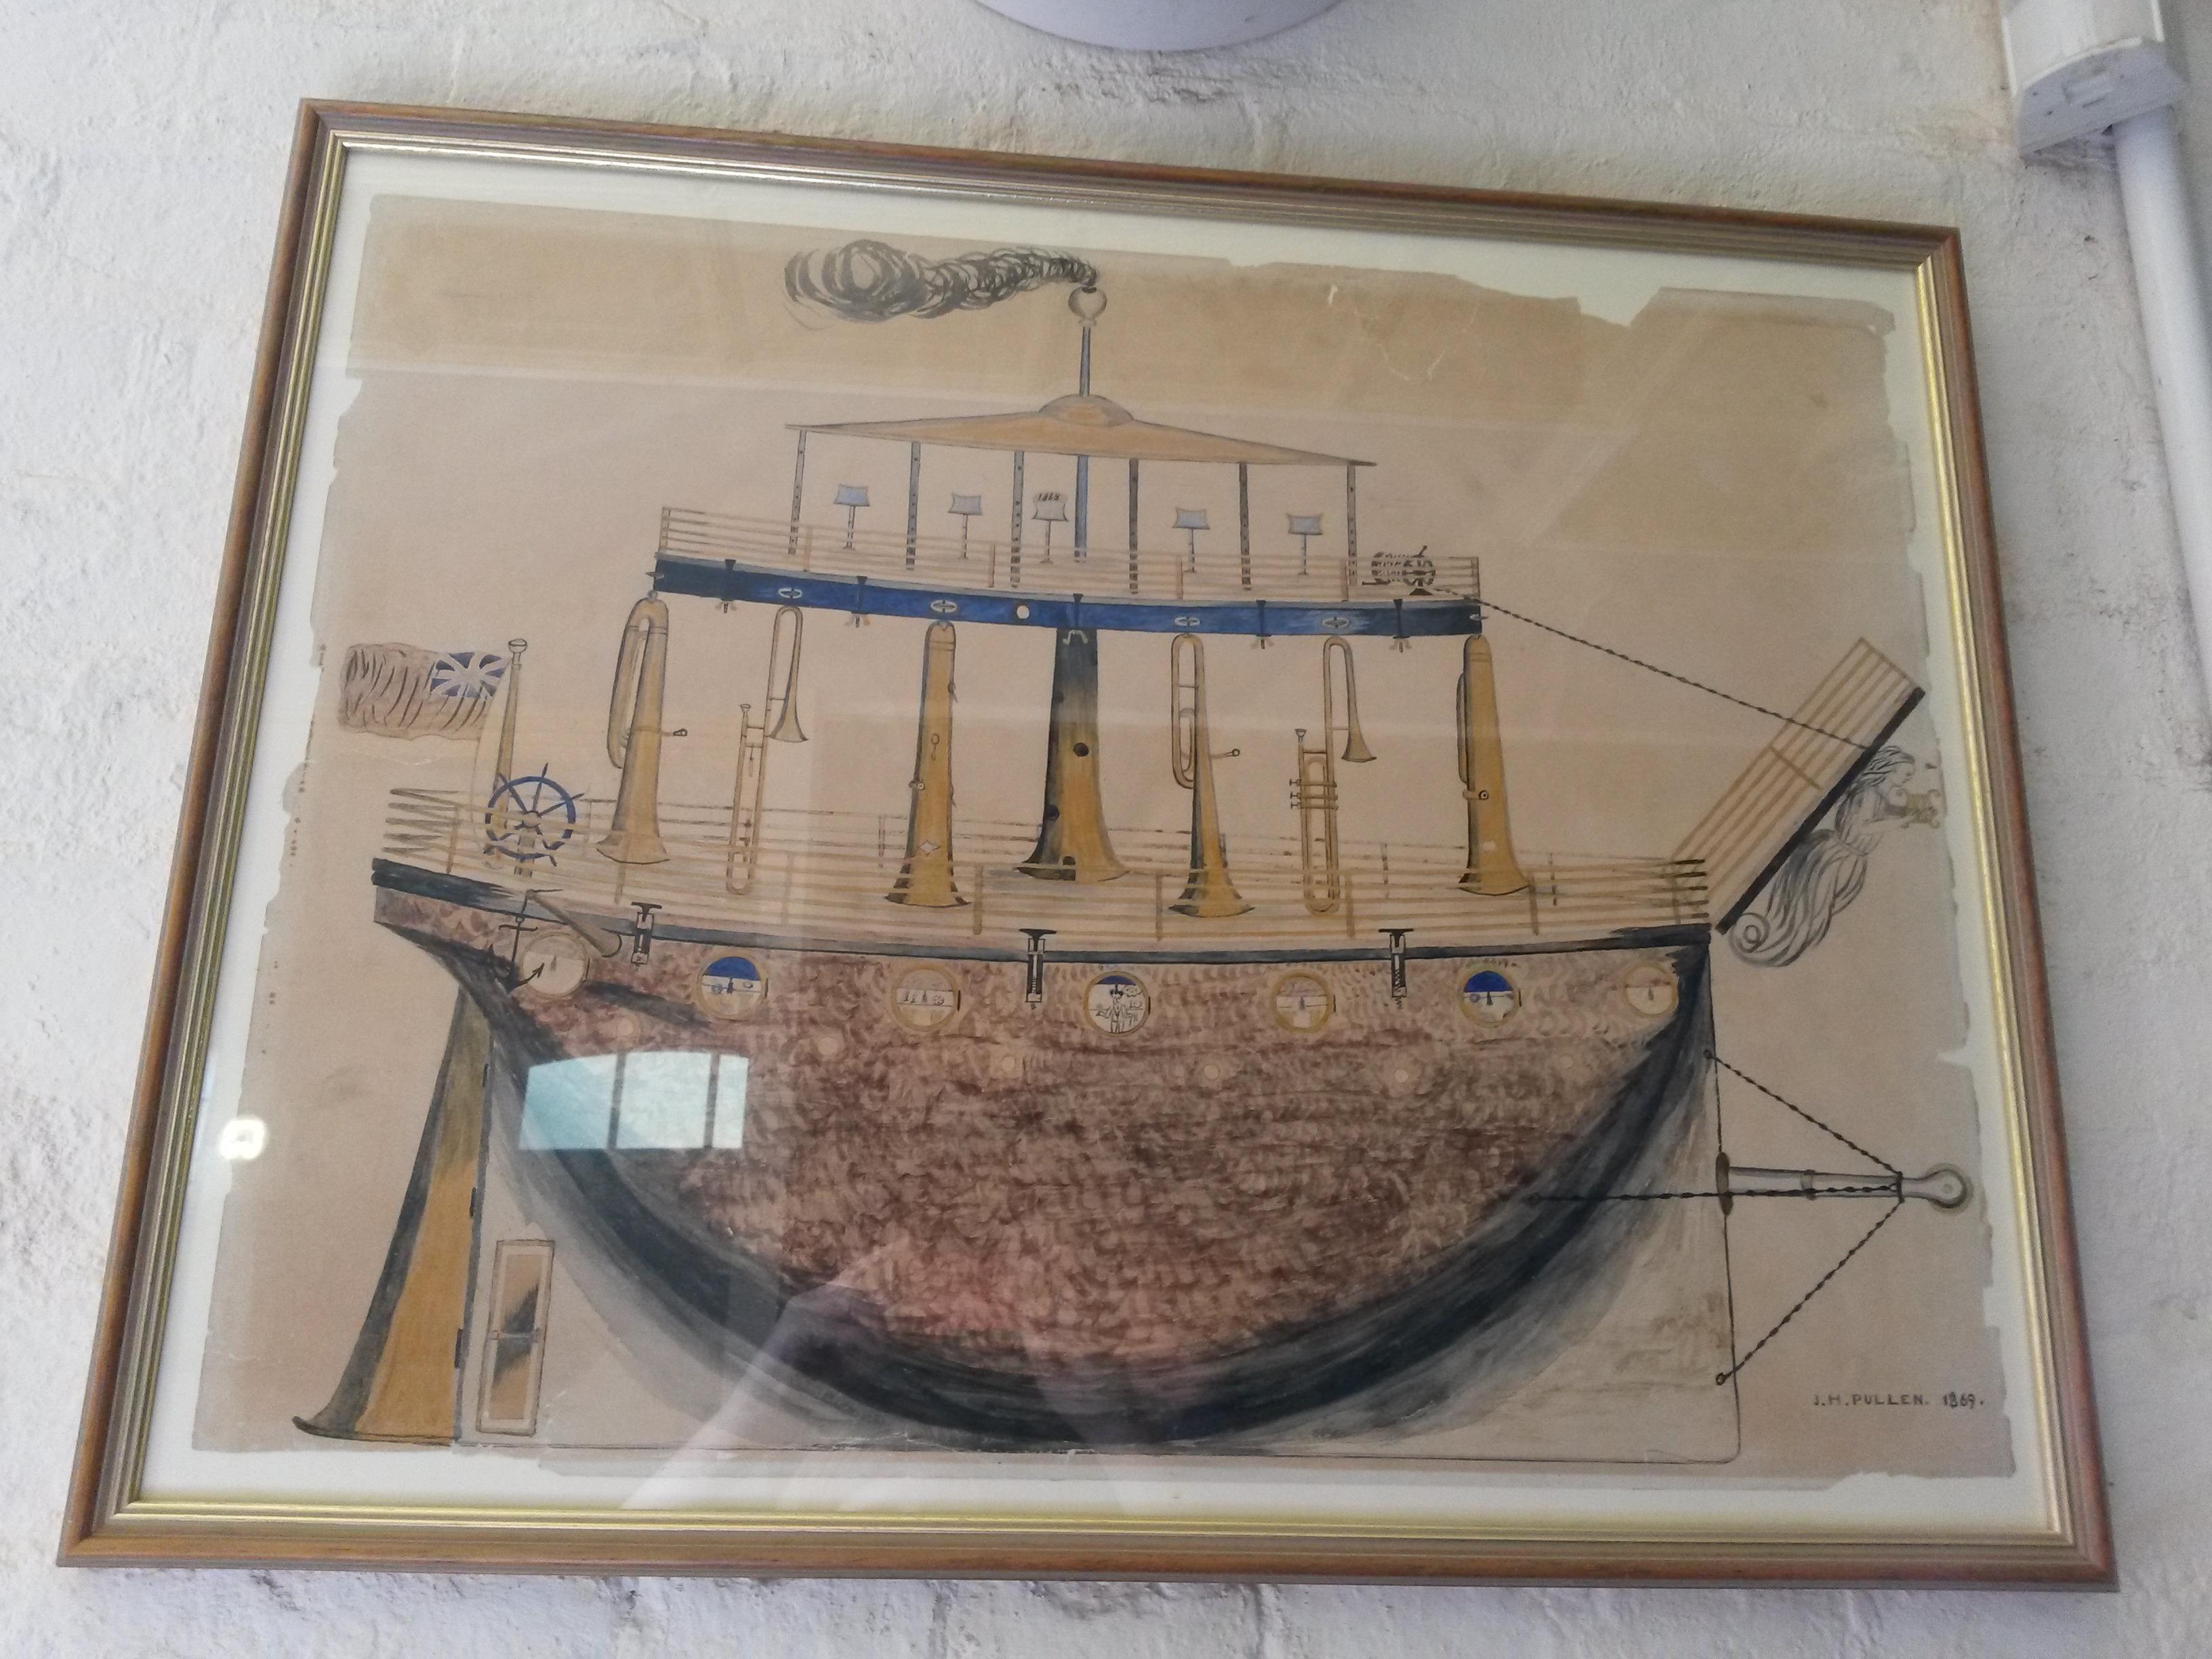 Pullen's design for a ship